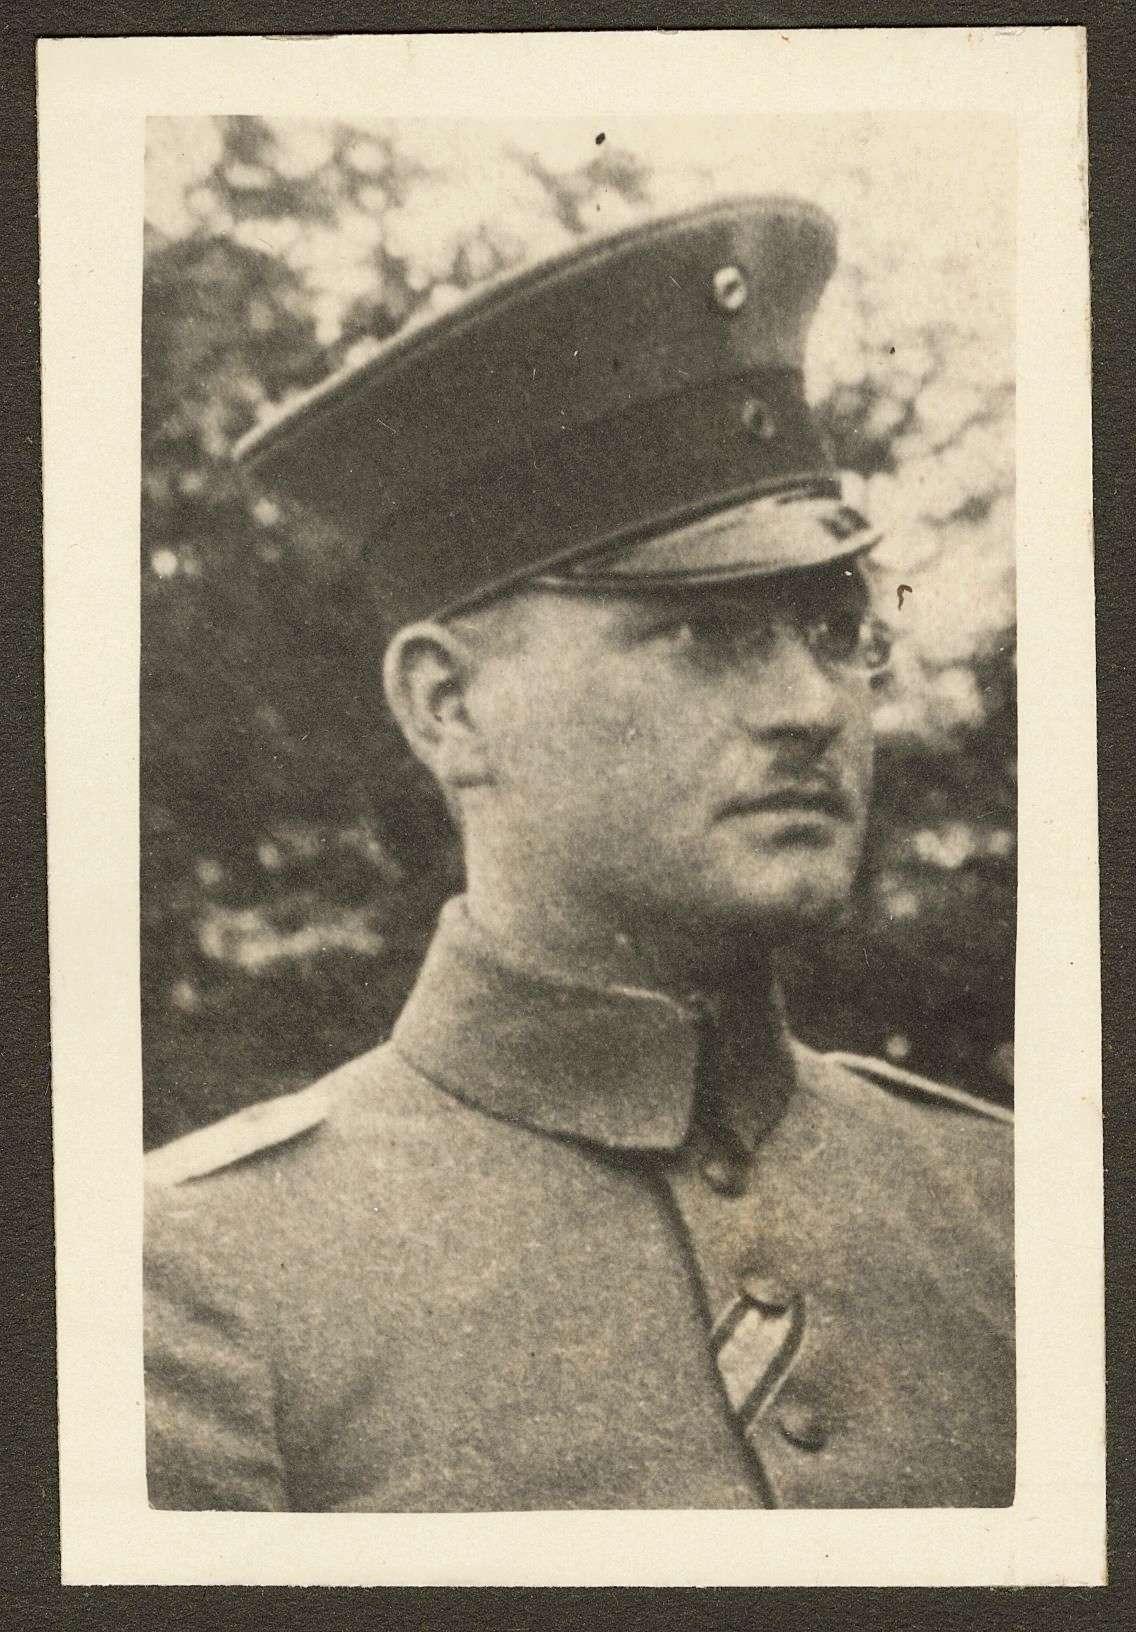 Linder, Theo, Bild 1